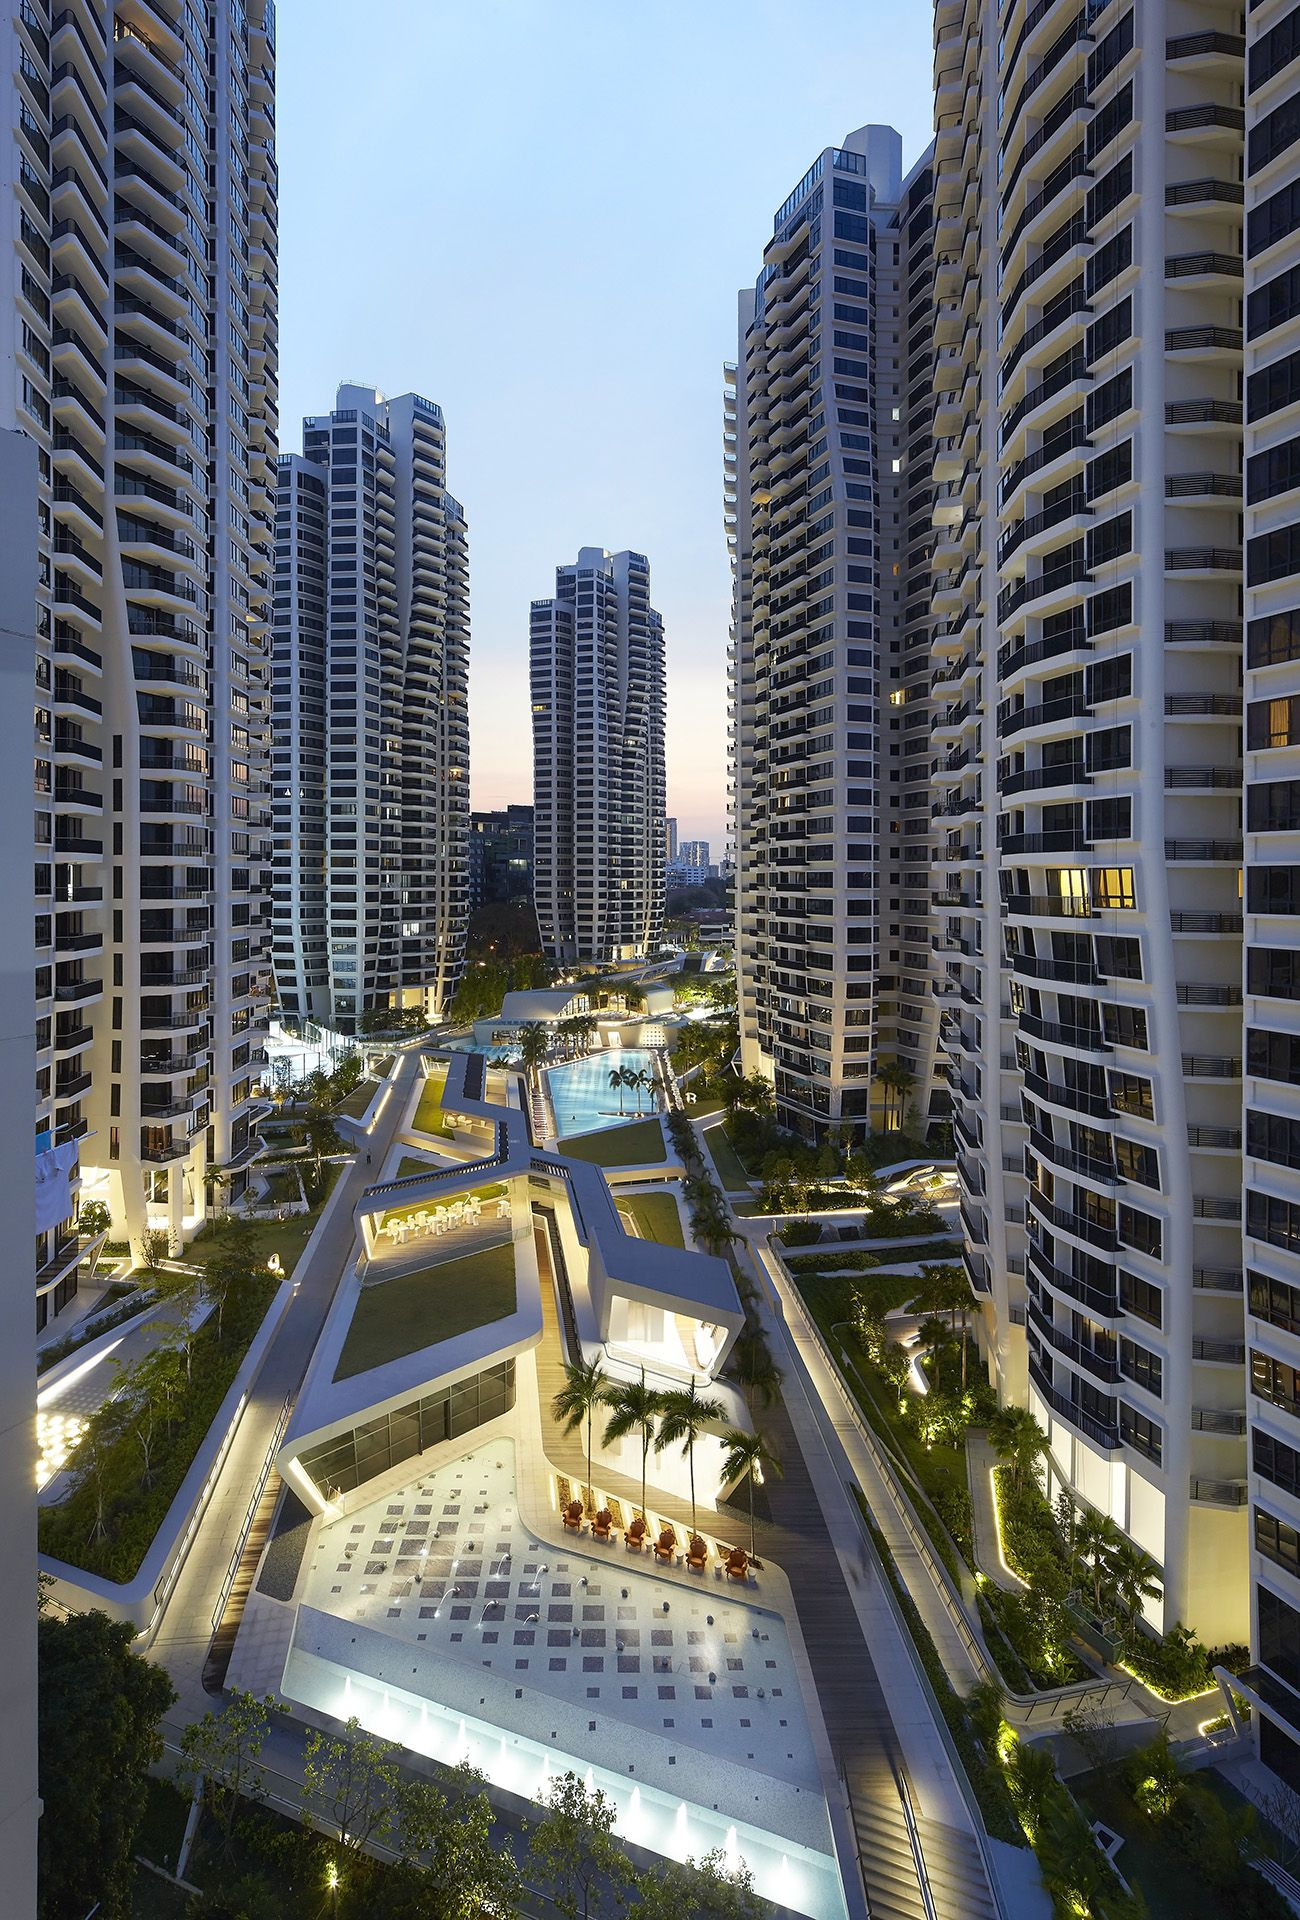 High Quality Du0027Leedon Condominium, Singapore   Zaha Hadid Architects